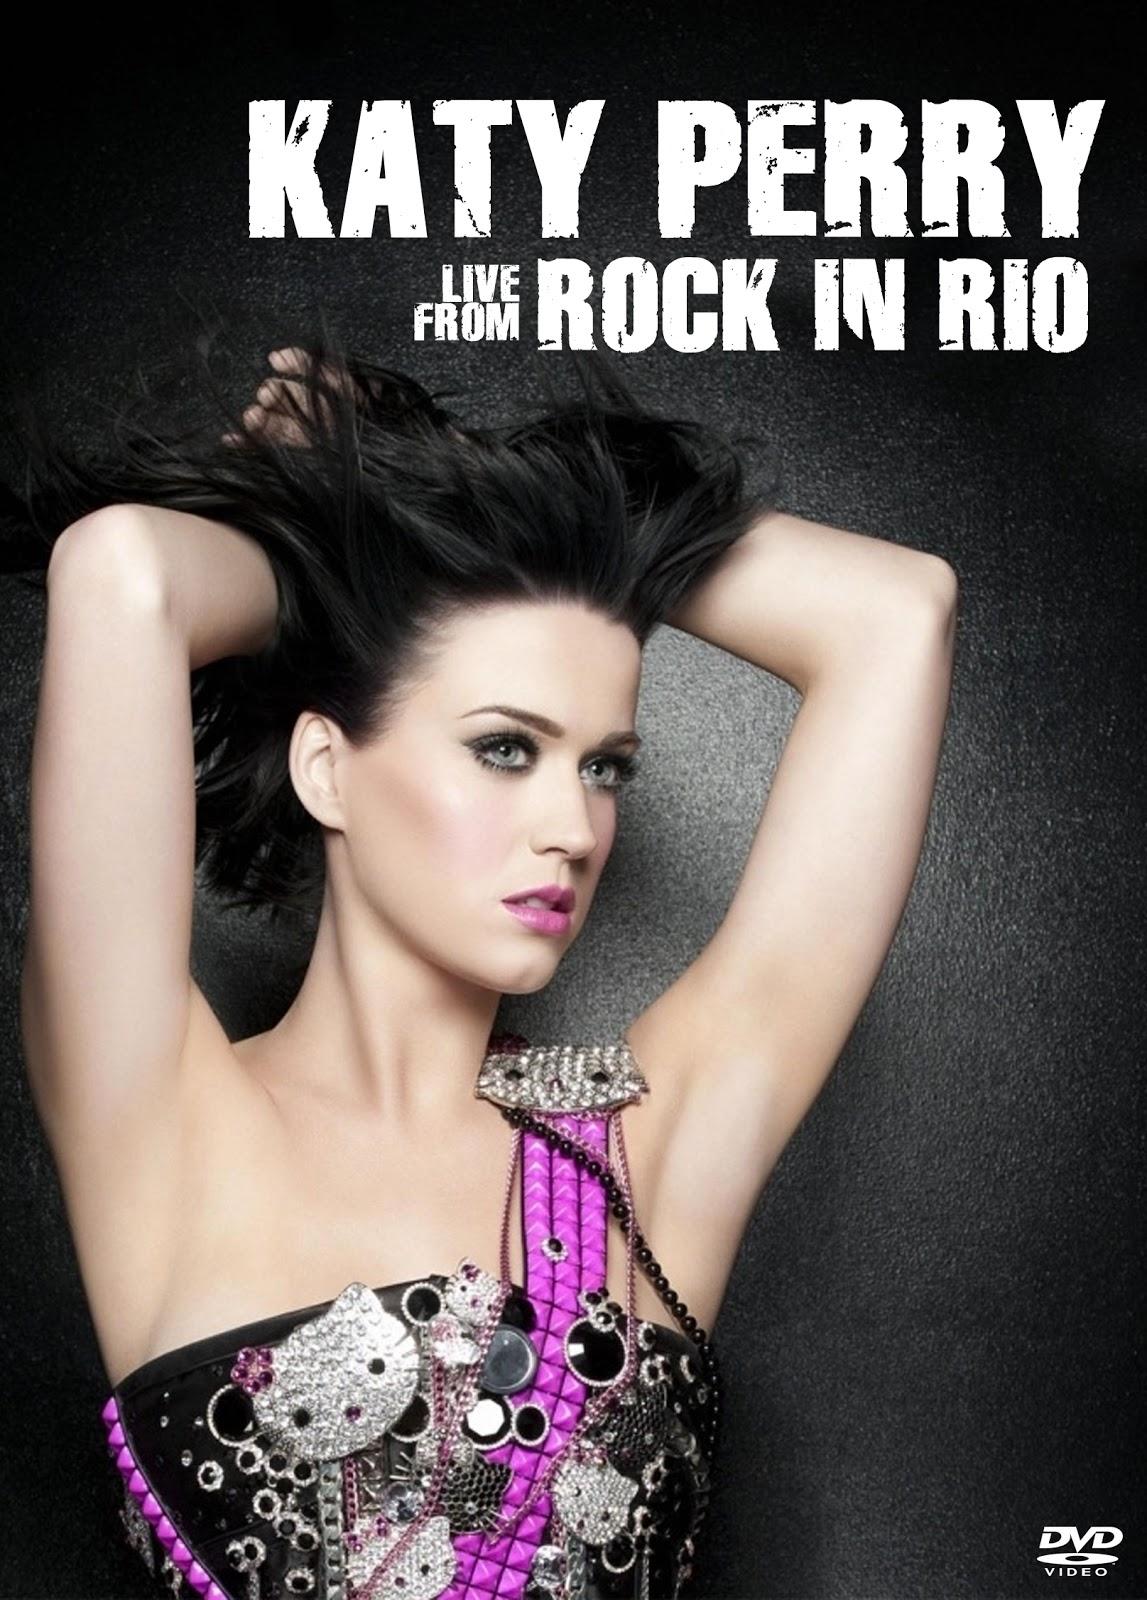 http://4.bp.blogspot.com/-pDB_aJVQ7vM/ToXs6gGZTbI/AAAAAAAABgc/SY8RFfGHXhM/s1600/Katy+Perry+Live+from+Rock+in+Rio.jpg